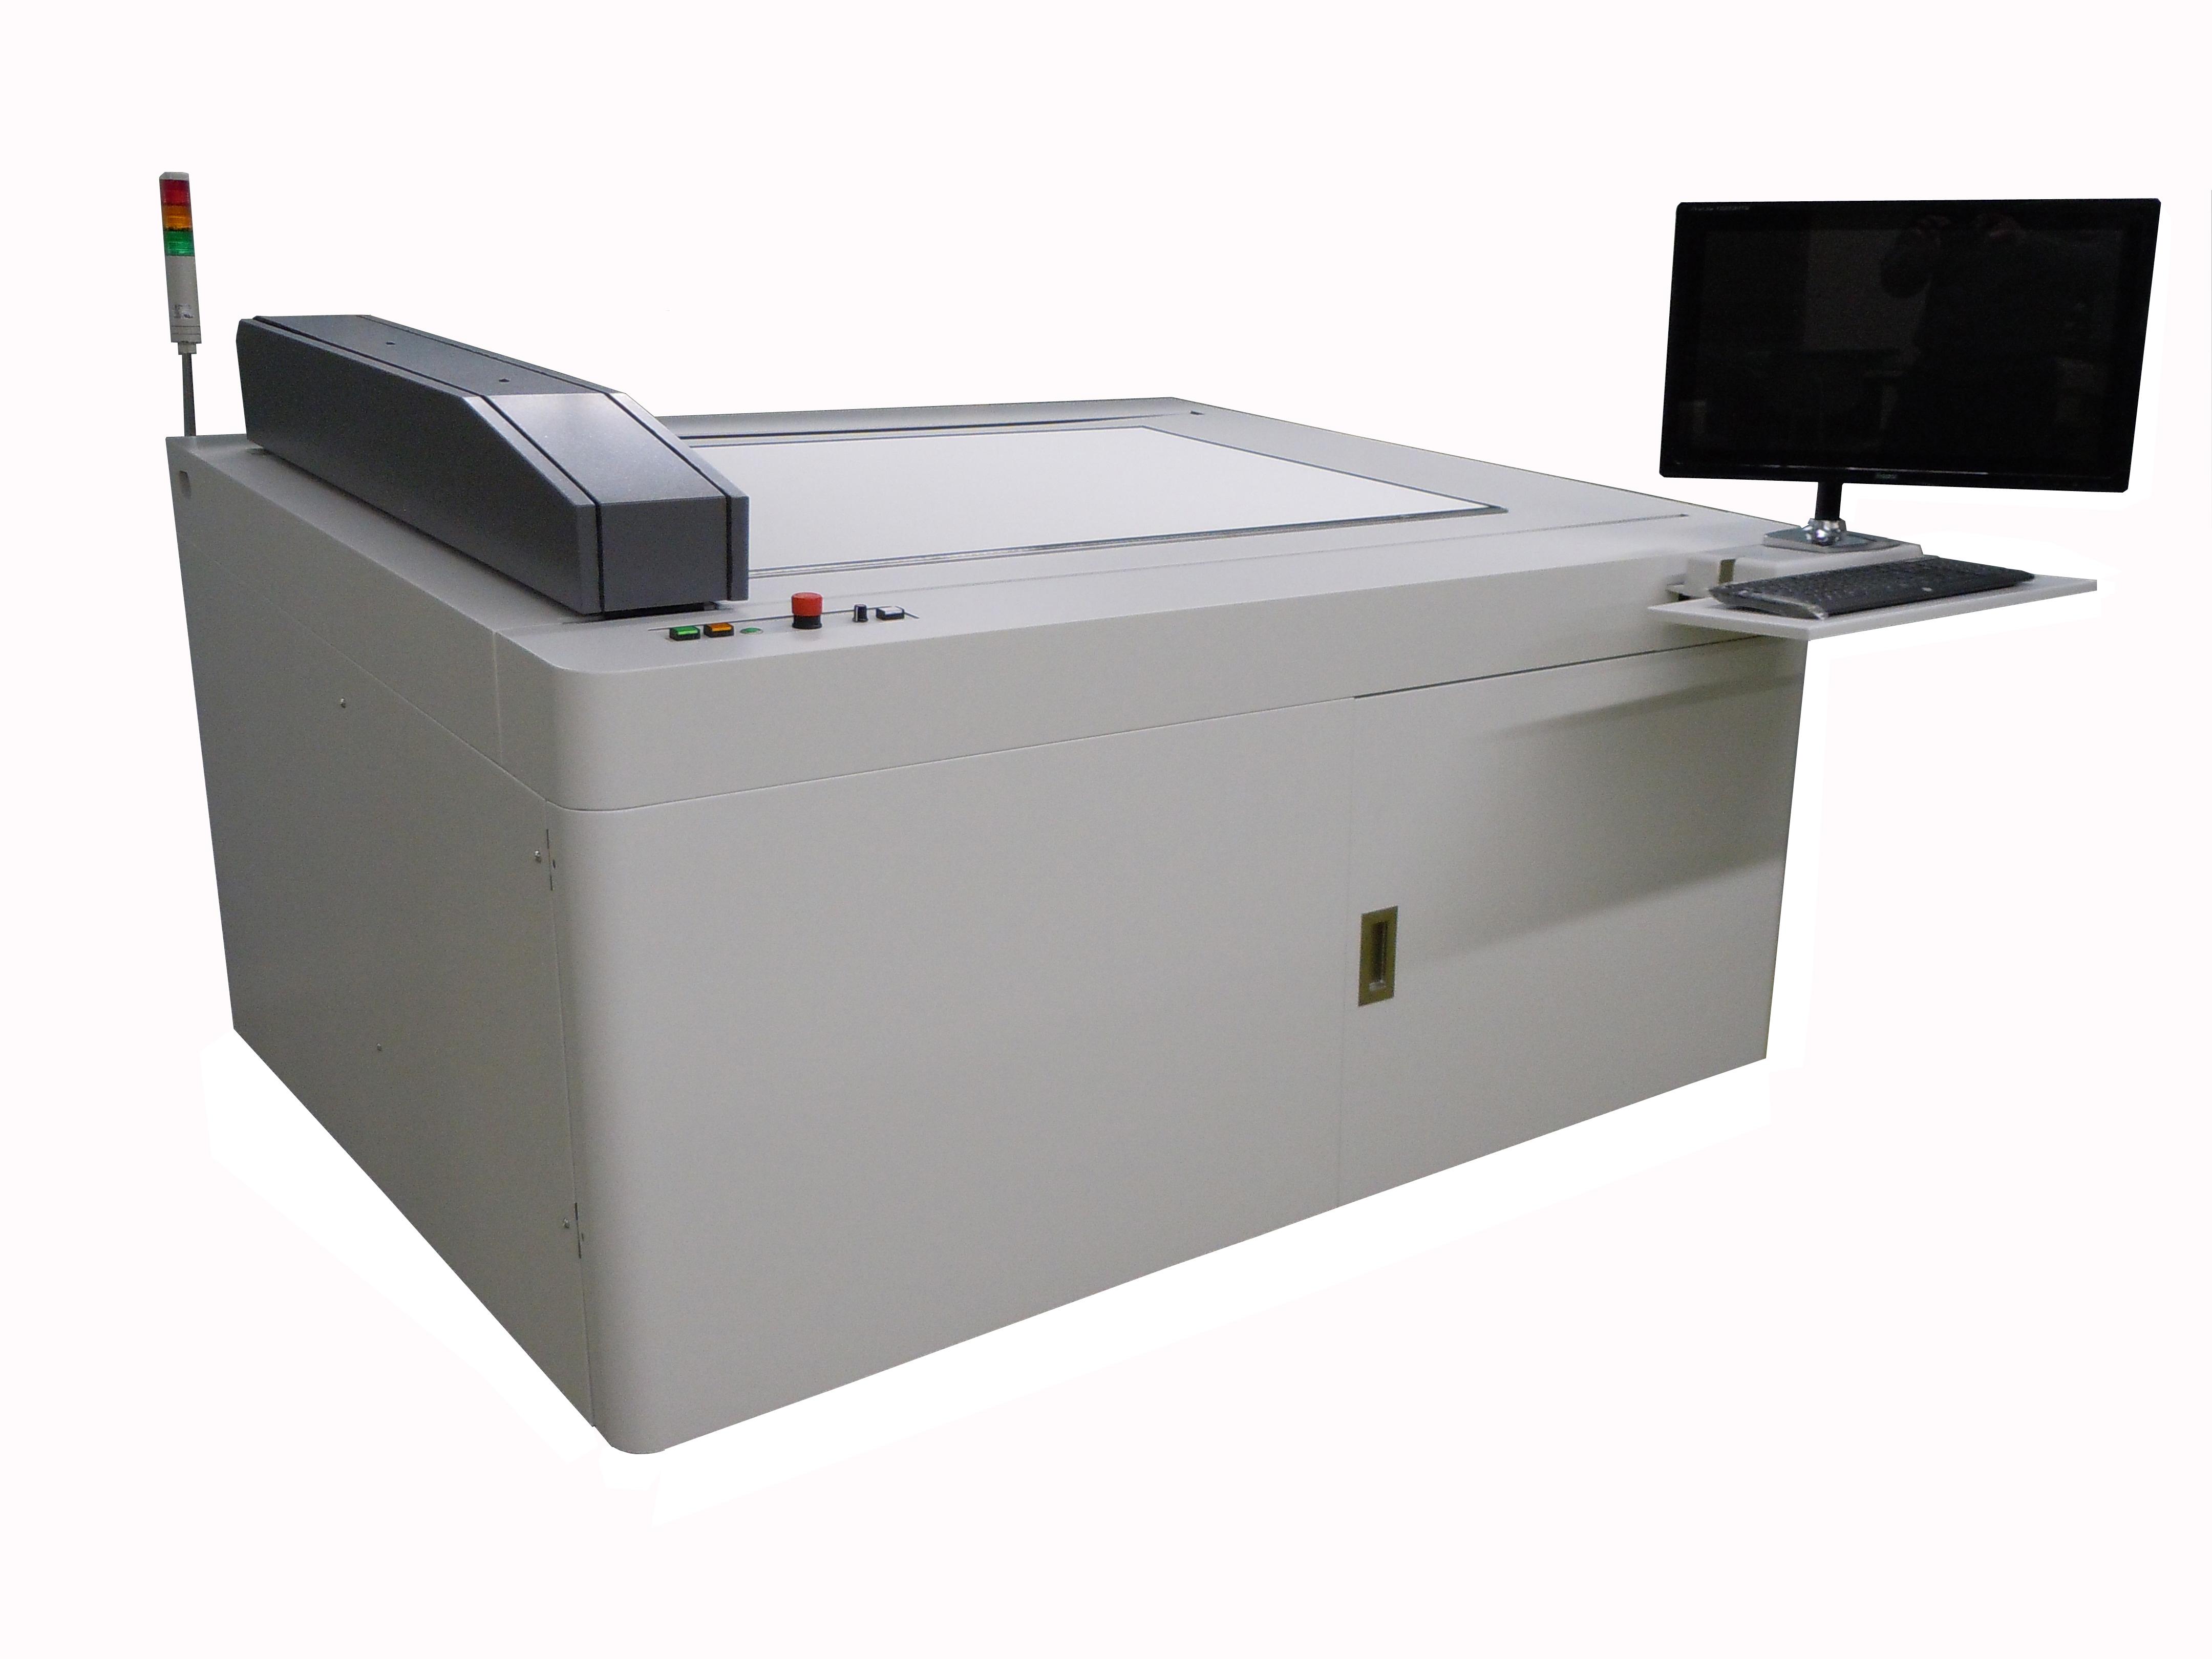 iSCAMERA-PM FP1000-R